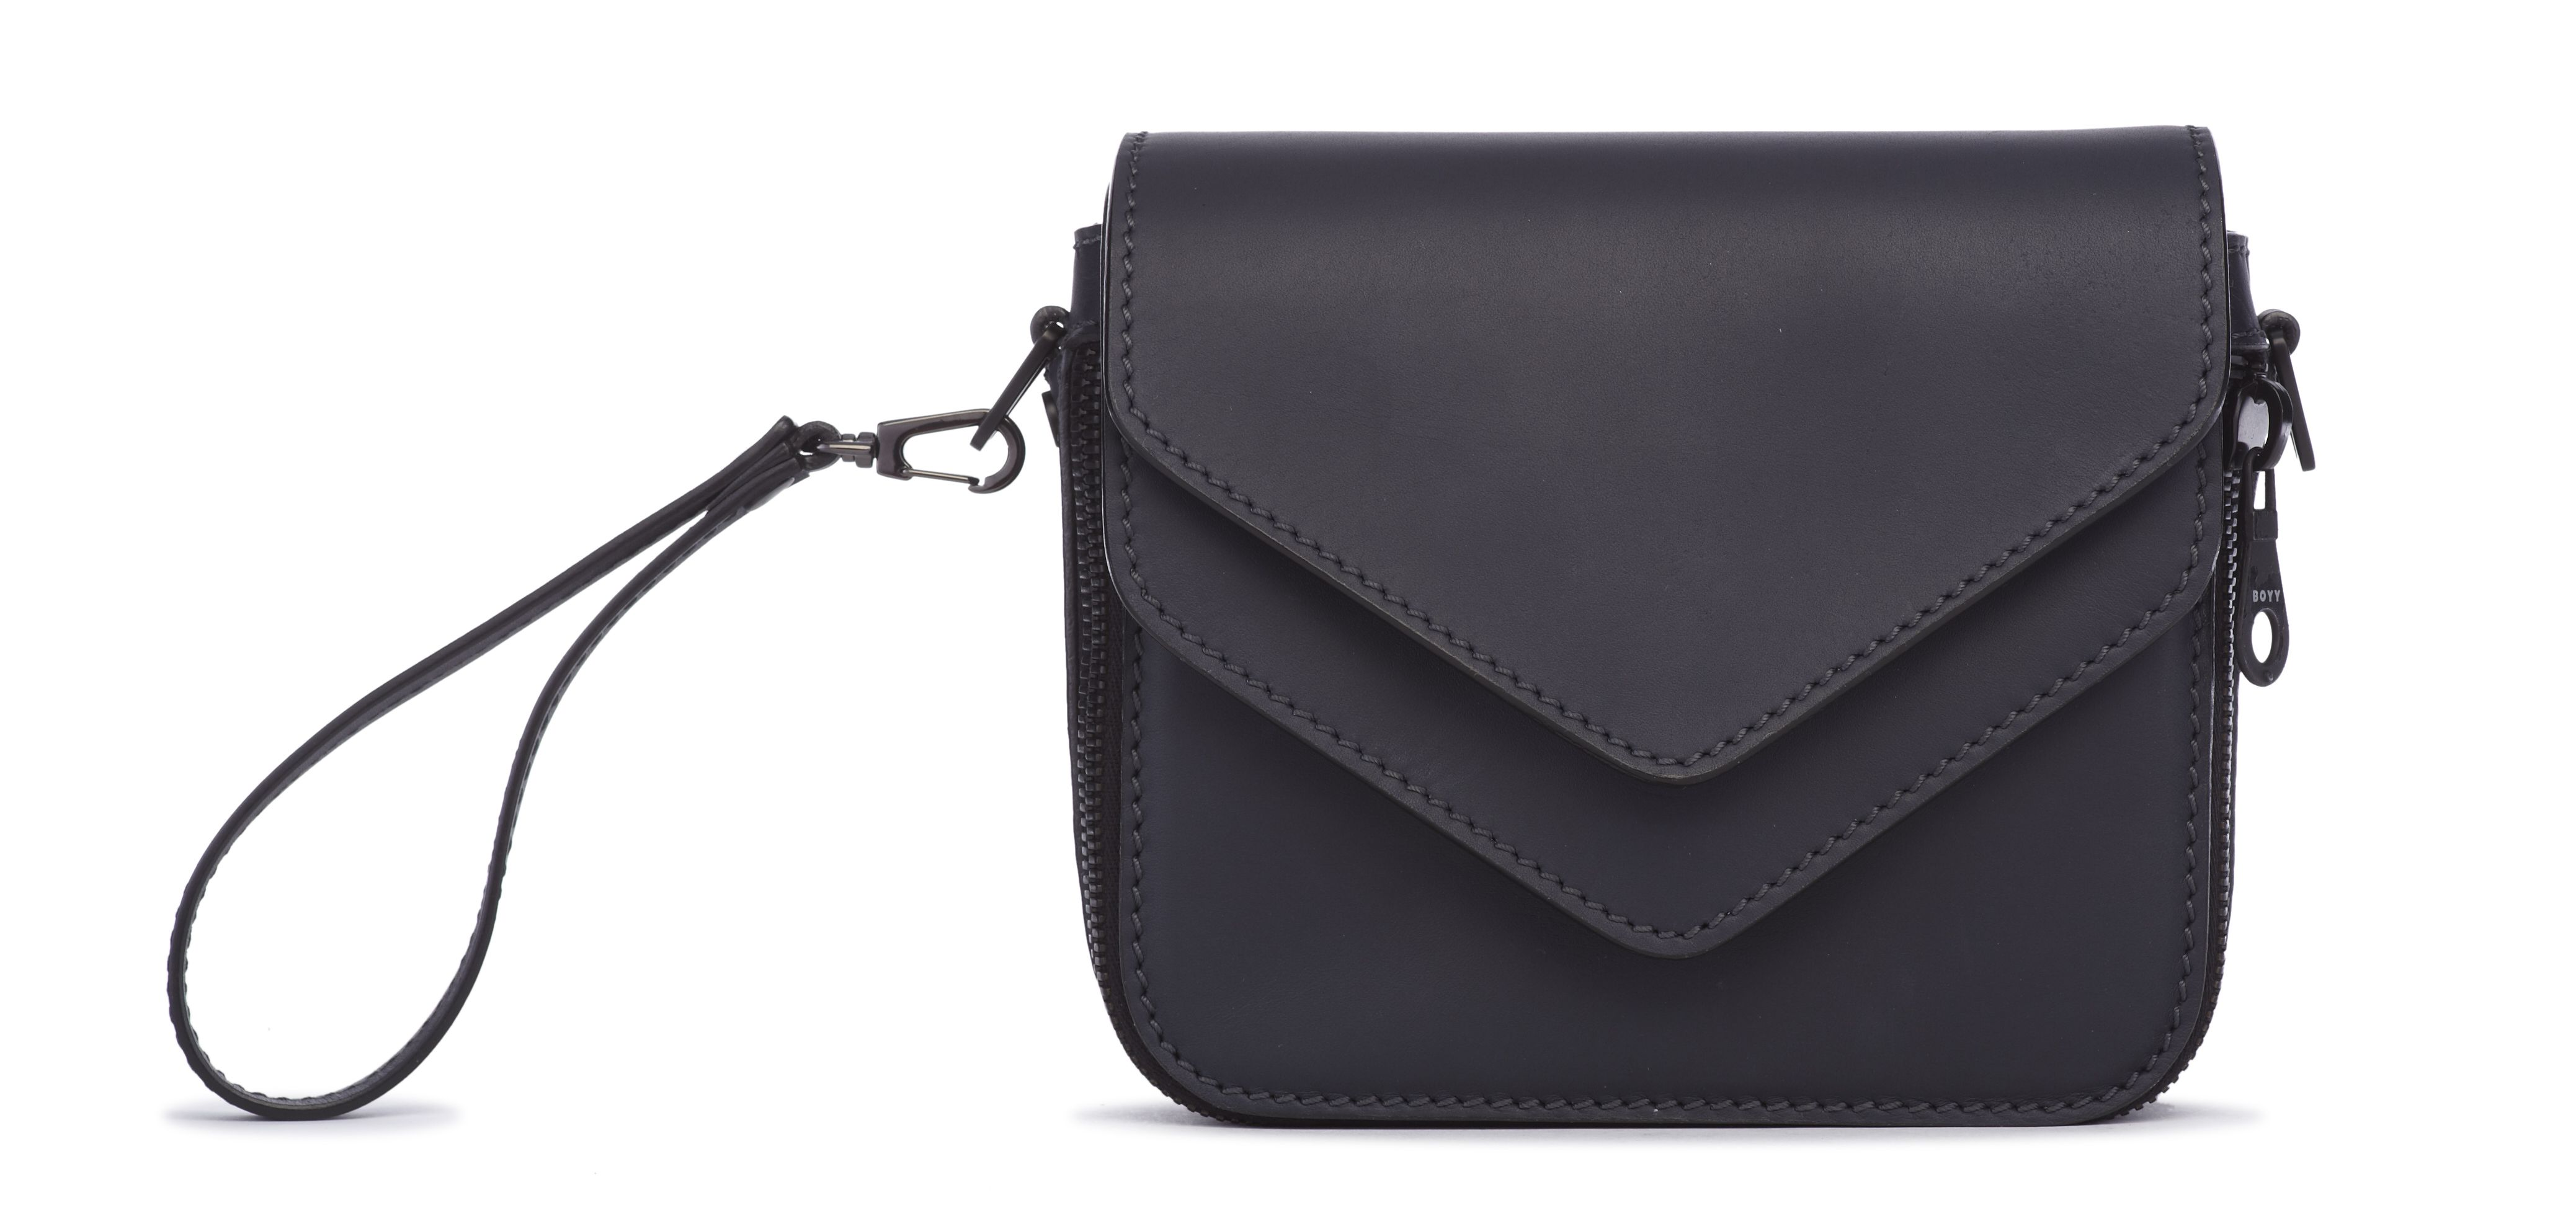 Filippo Black Flap Black Body Boyy Bags Handbags